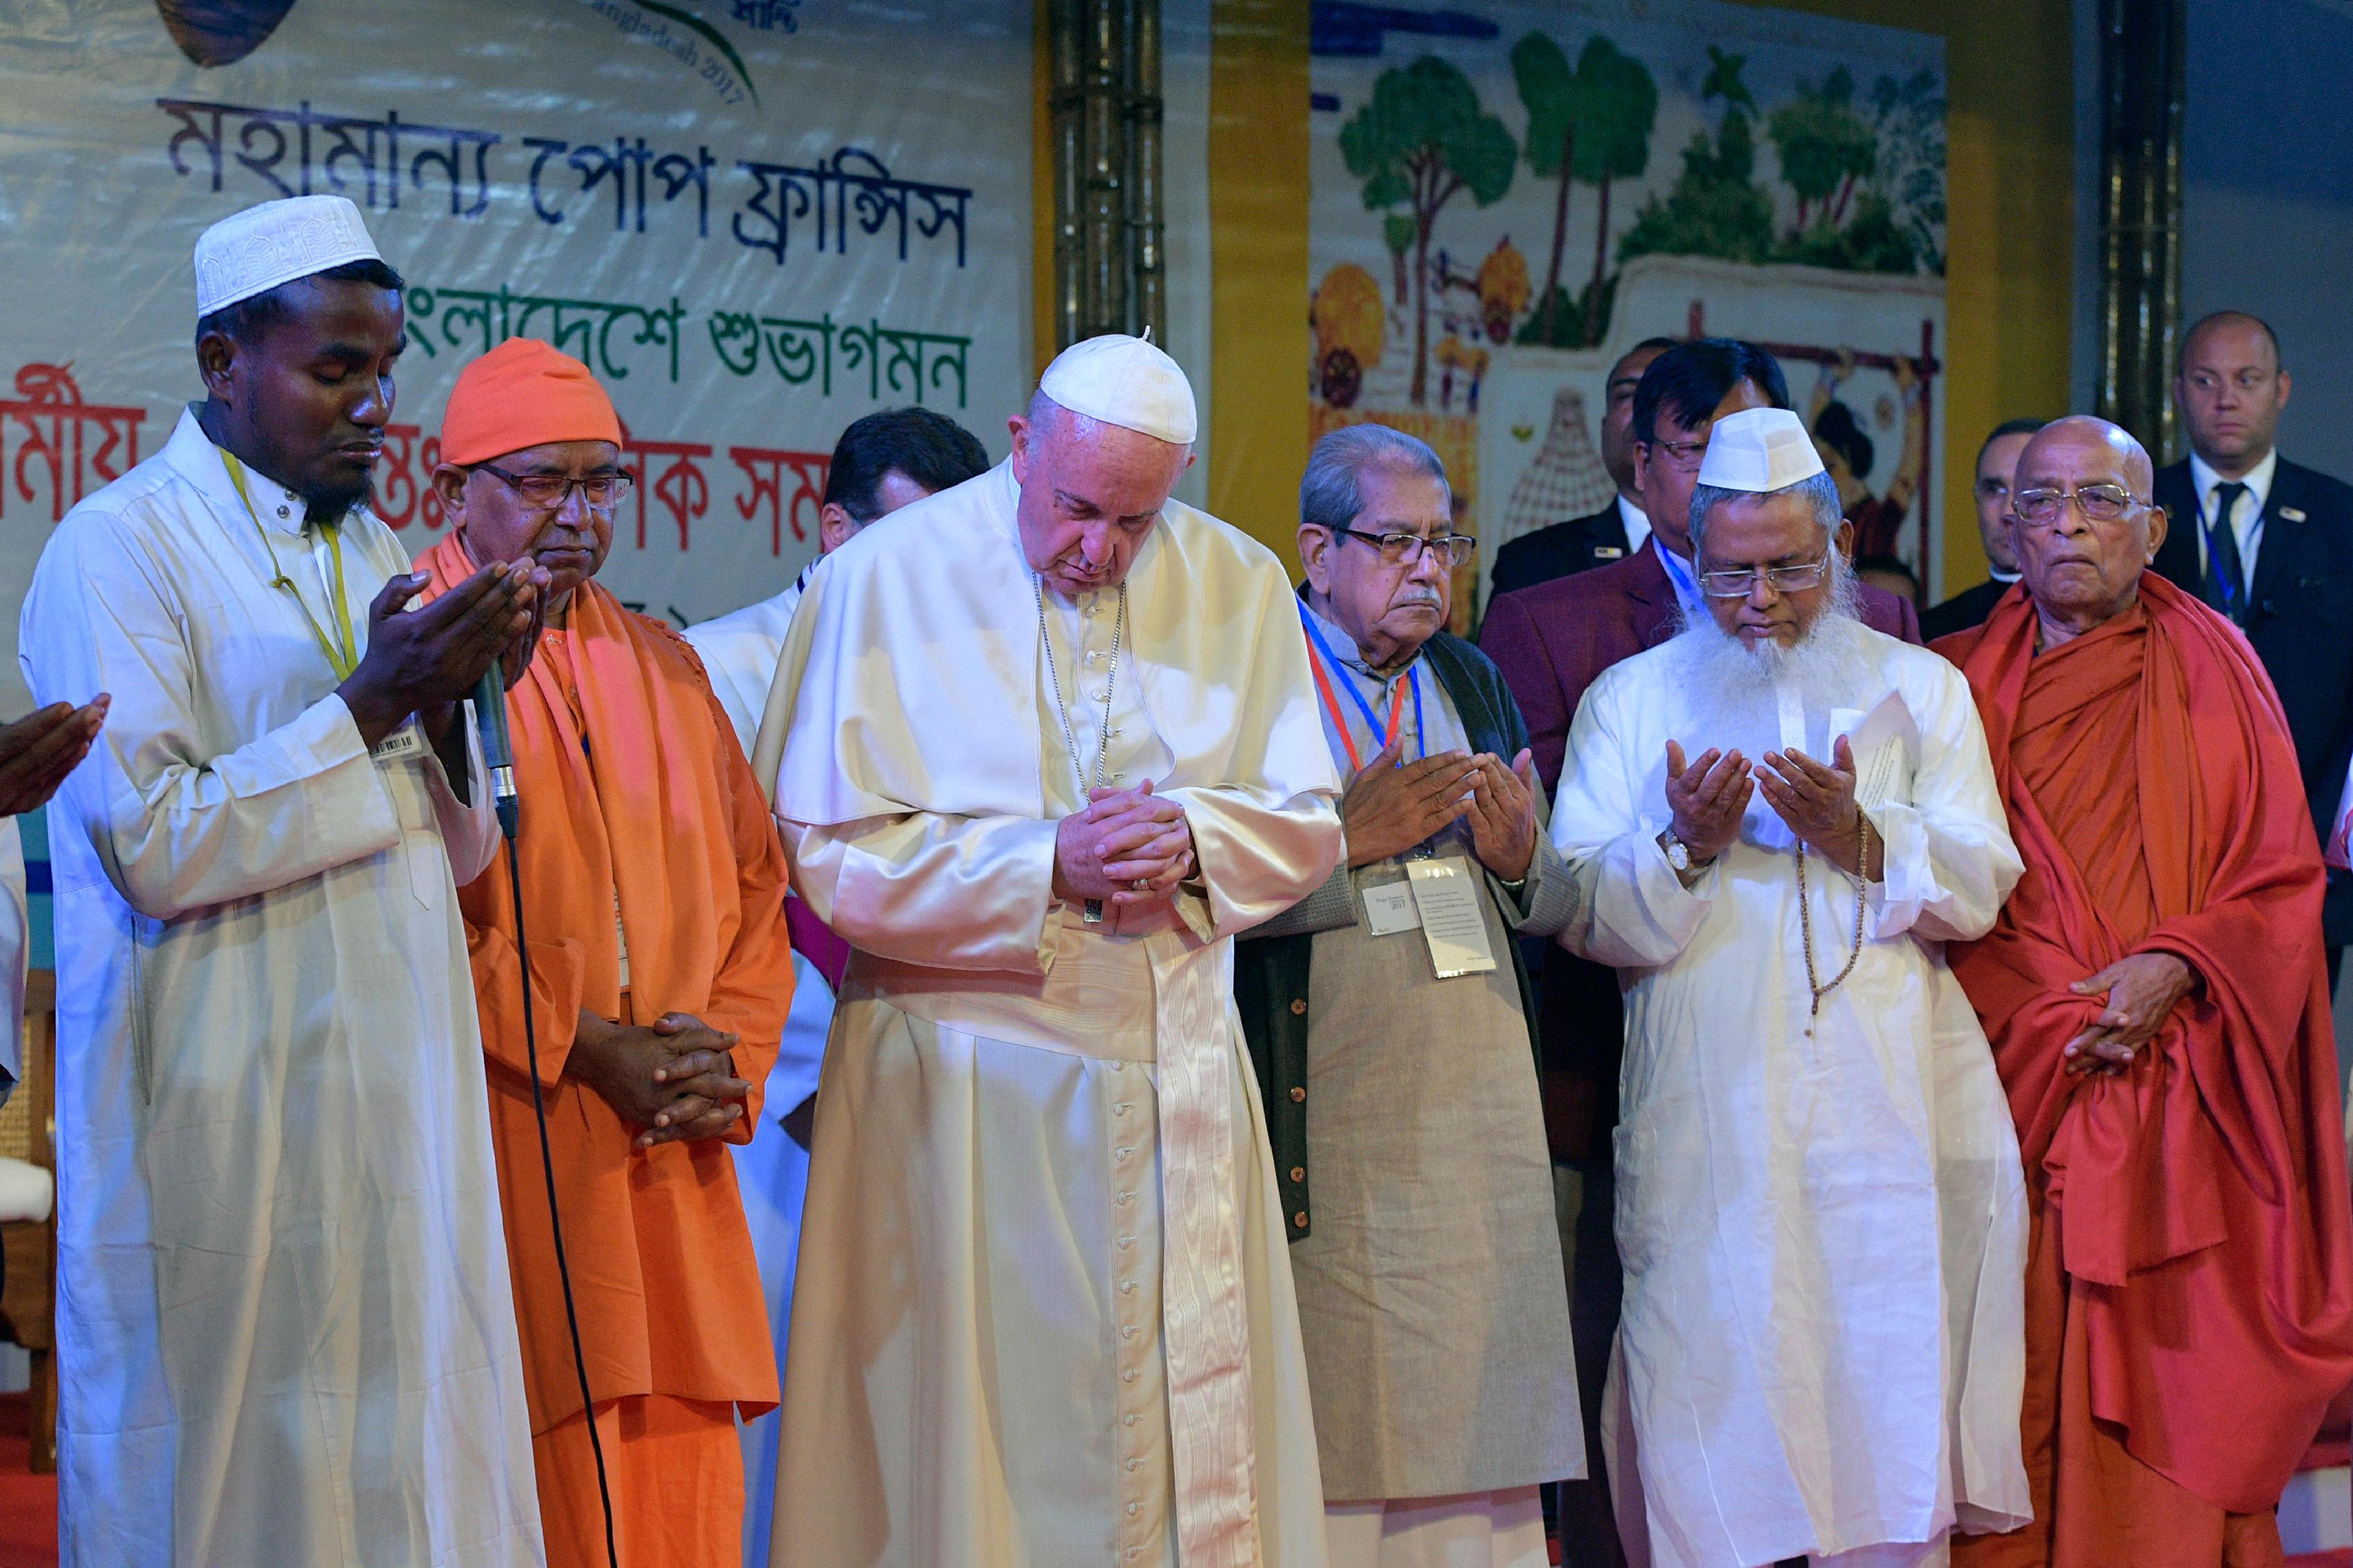 Encuentro interreligioso por la paz en Dhaka, Bangladesh © L'Osservatore Romano